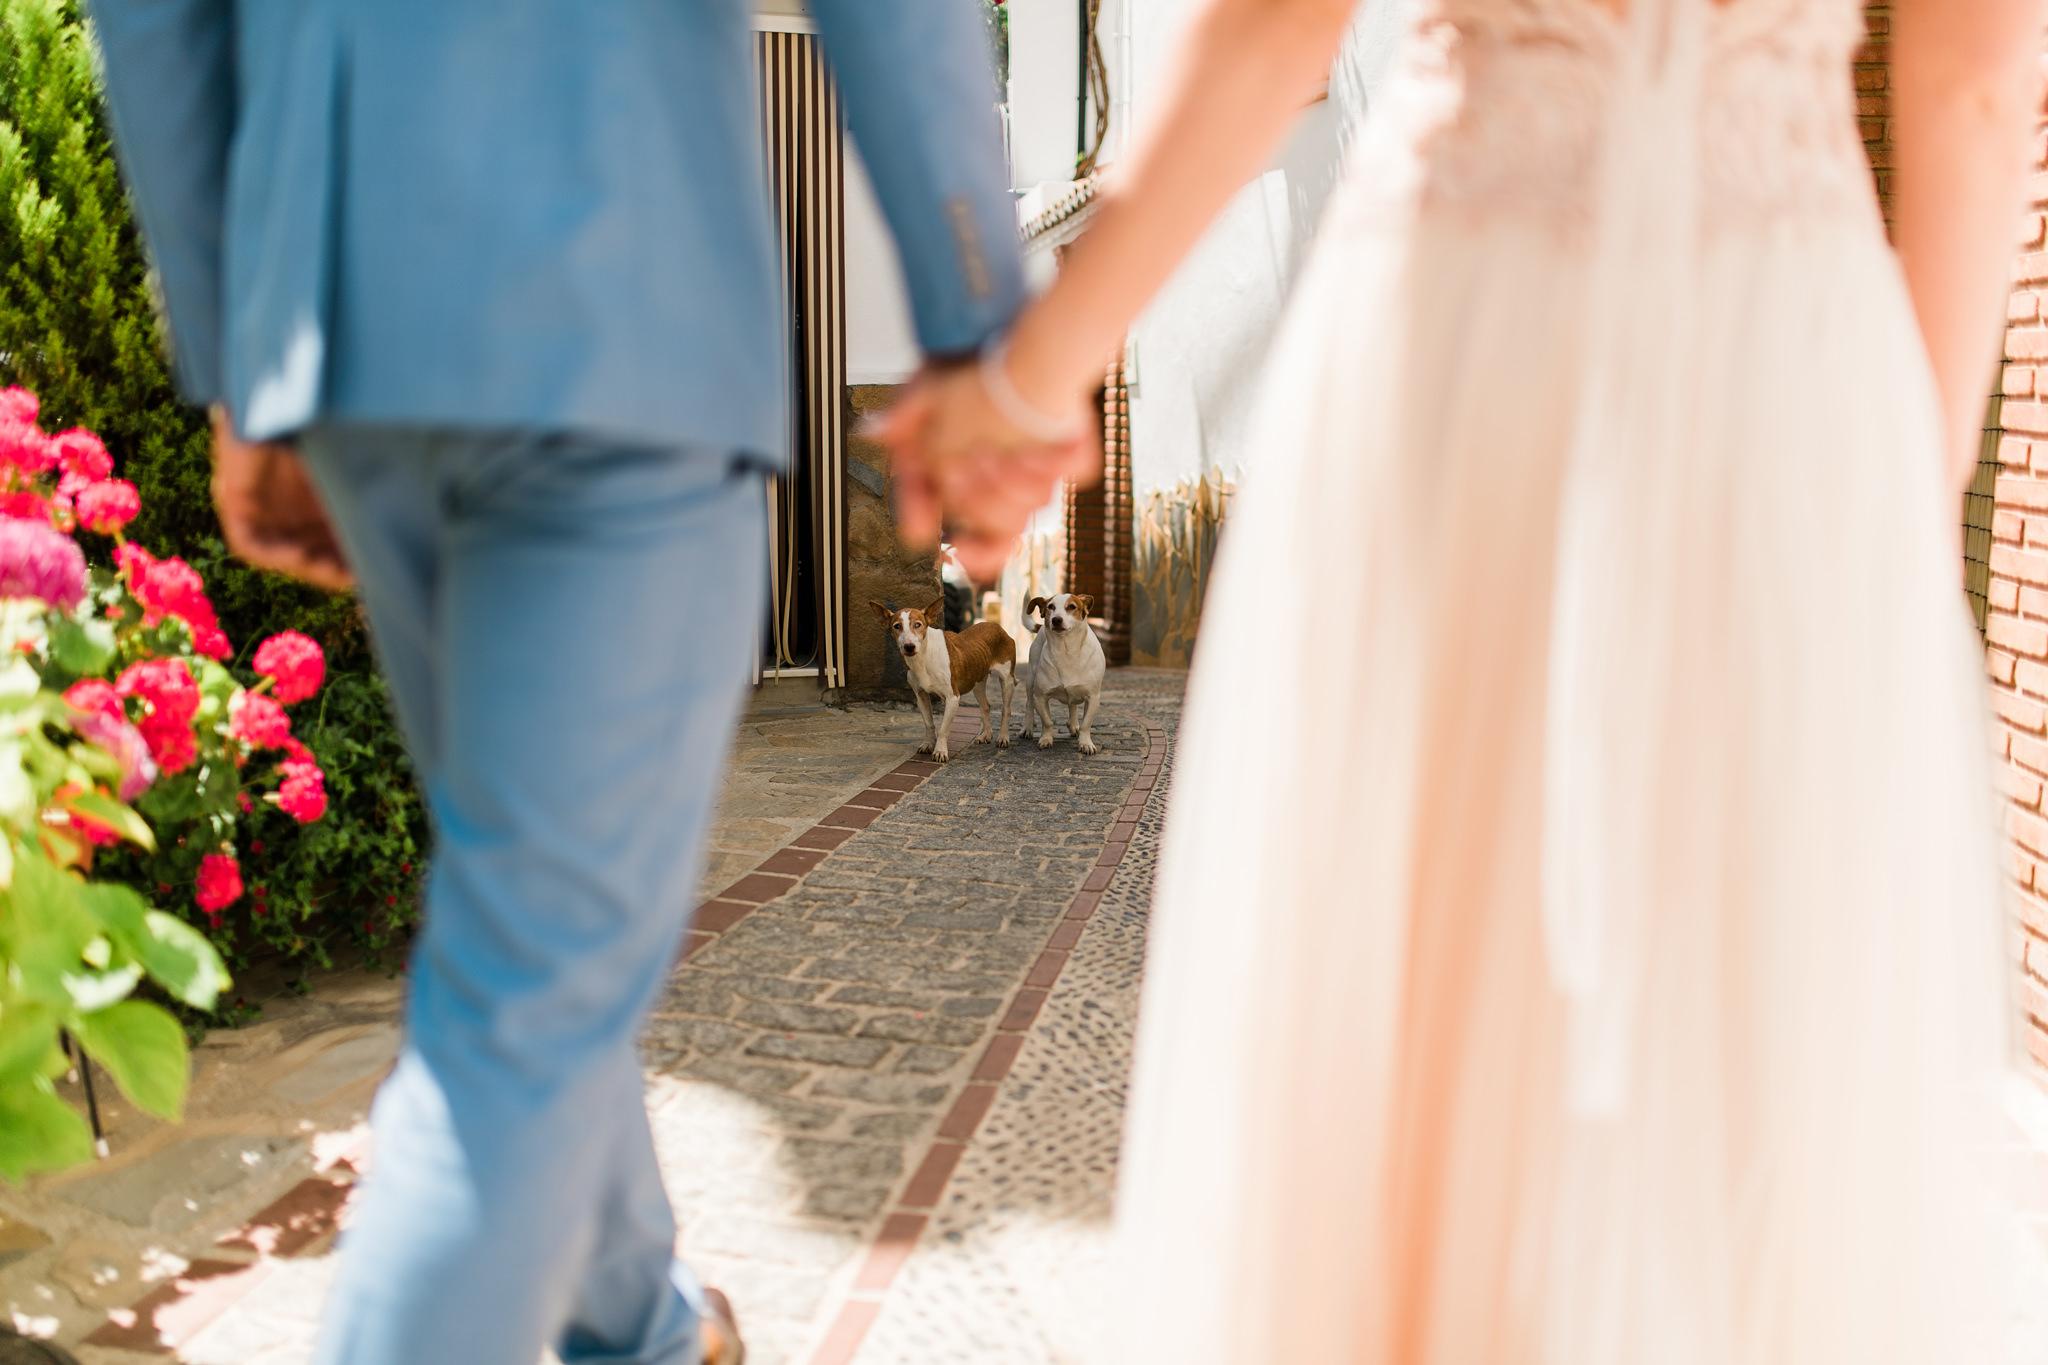 best-wedding-photographer-spain-andalucia-ronda-malaga-mj-studio